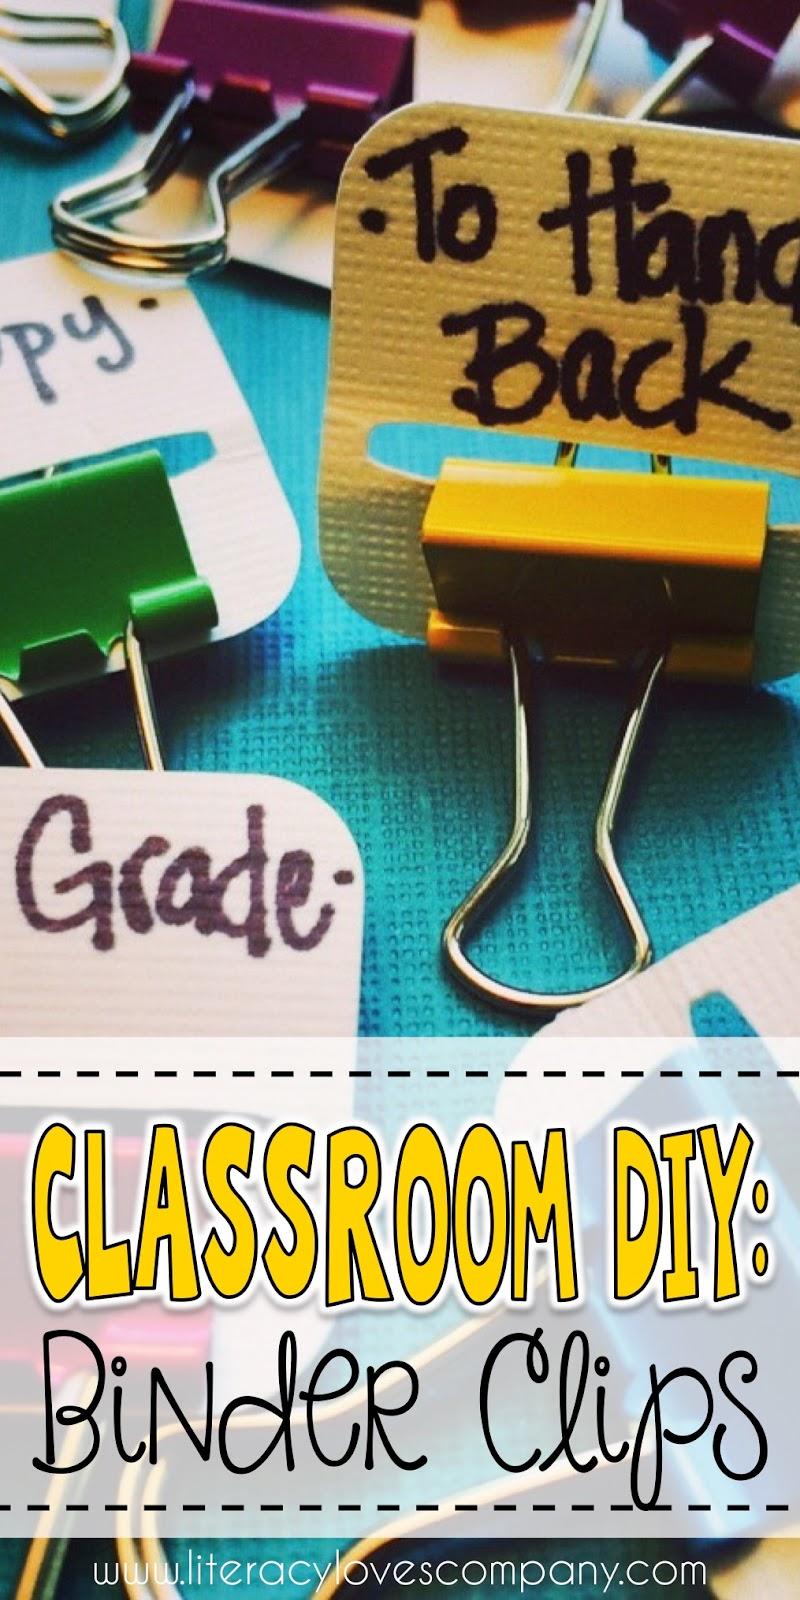 literacy loves company classroom diy binder clip tabs